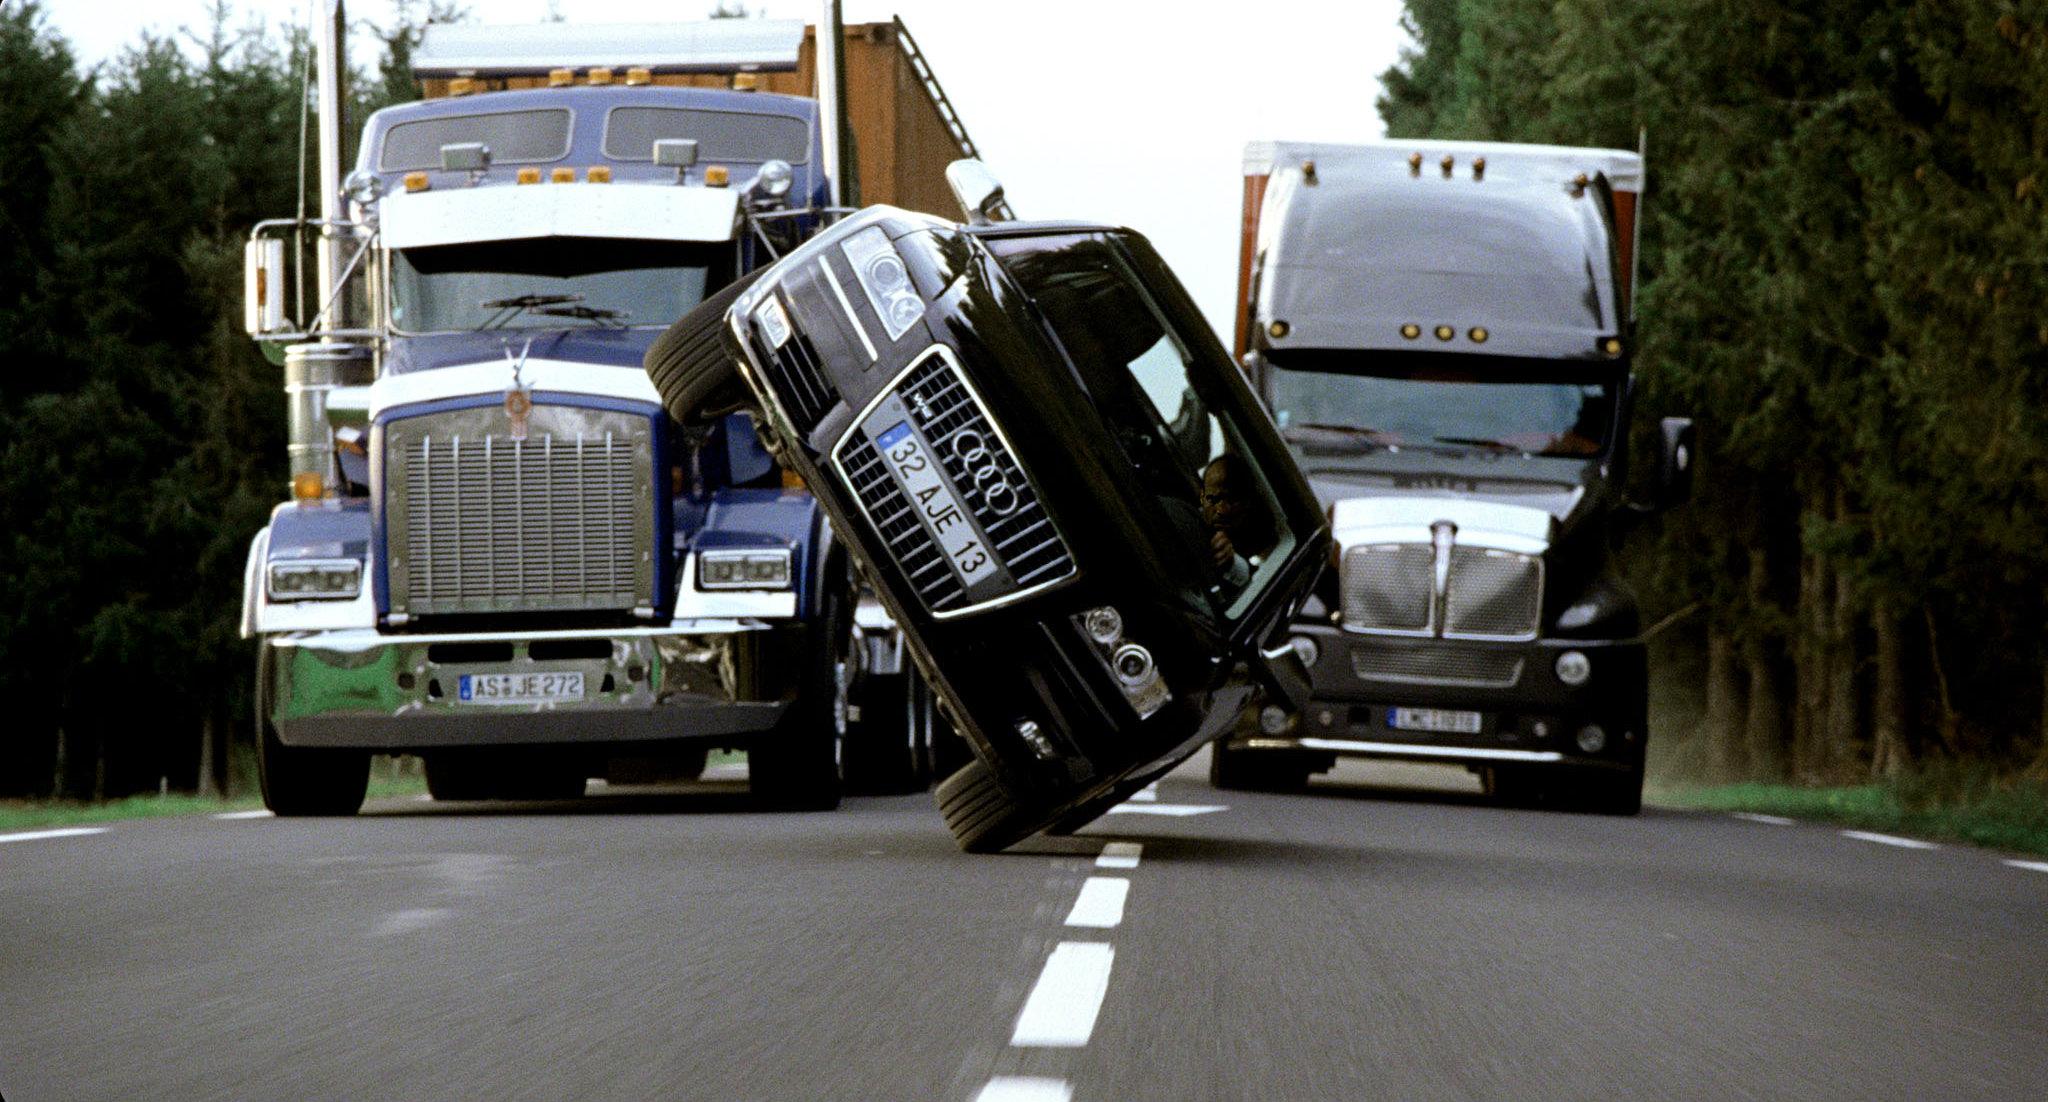 Kelebihan Kekurangan Audi Transporter Tangguh